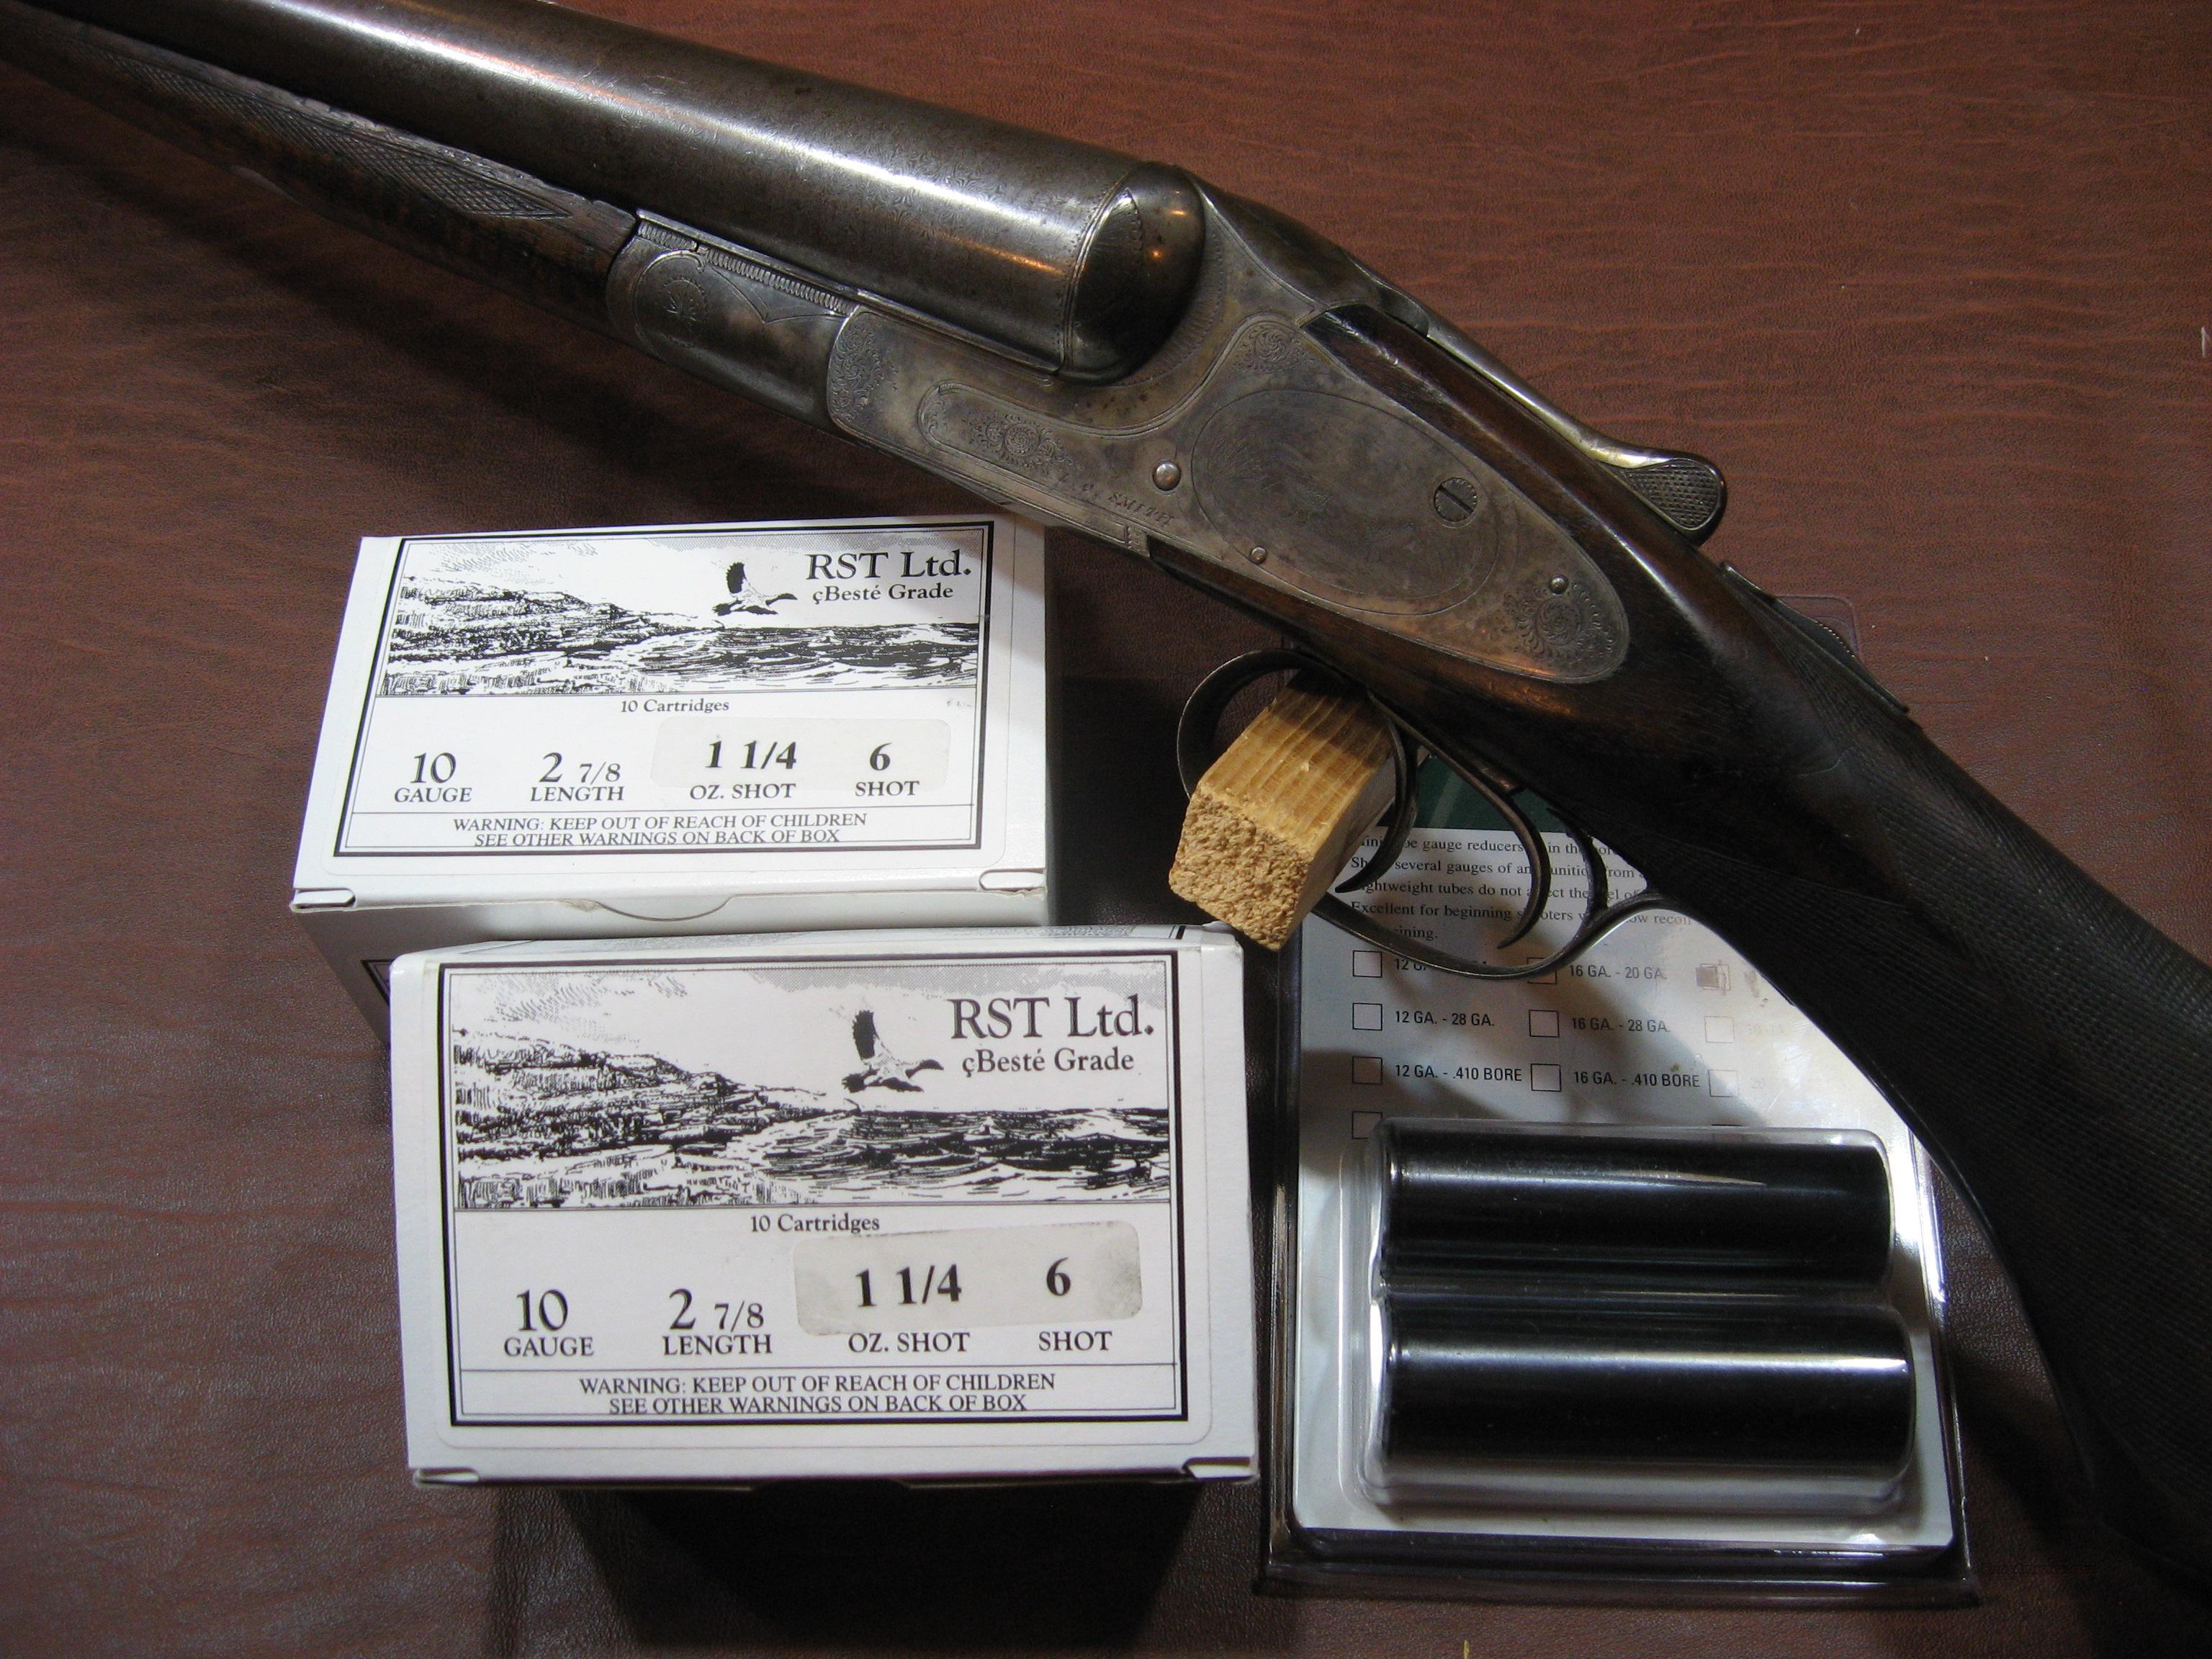 RARE - LC Smith Quality 3 - 10ga ONLY 90 made  Guns > Shotguns > L.C. Smith Shotguns